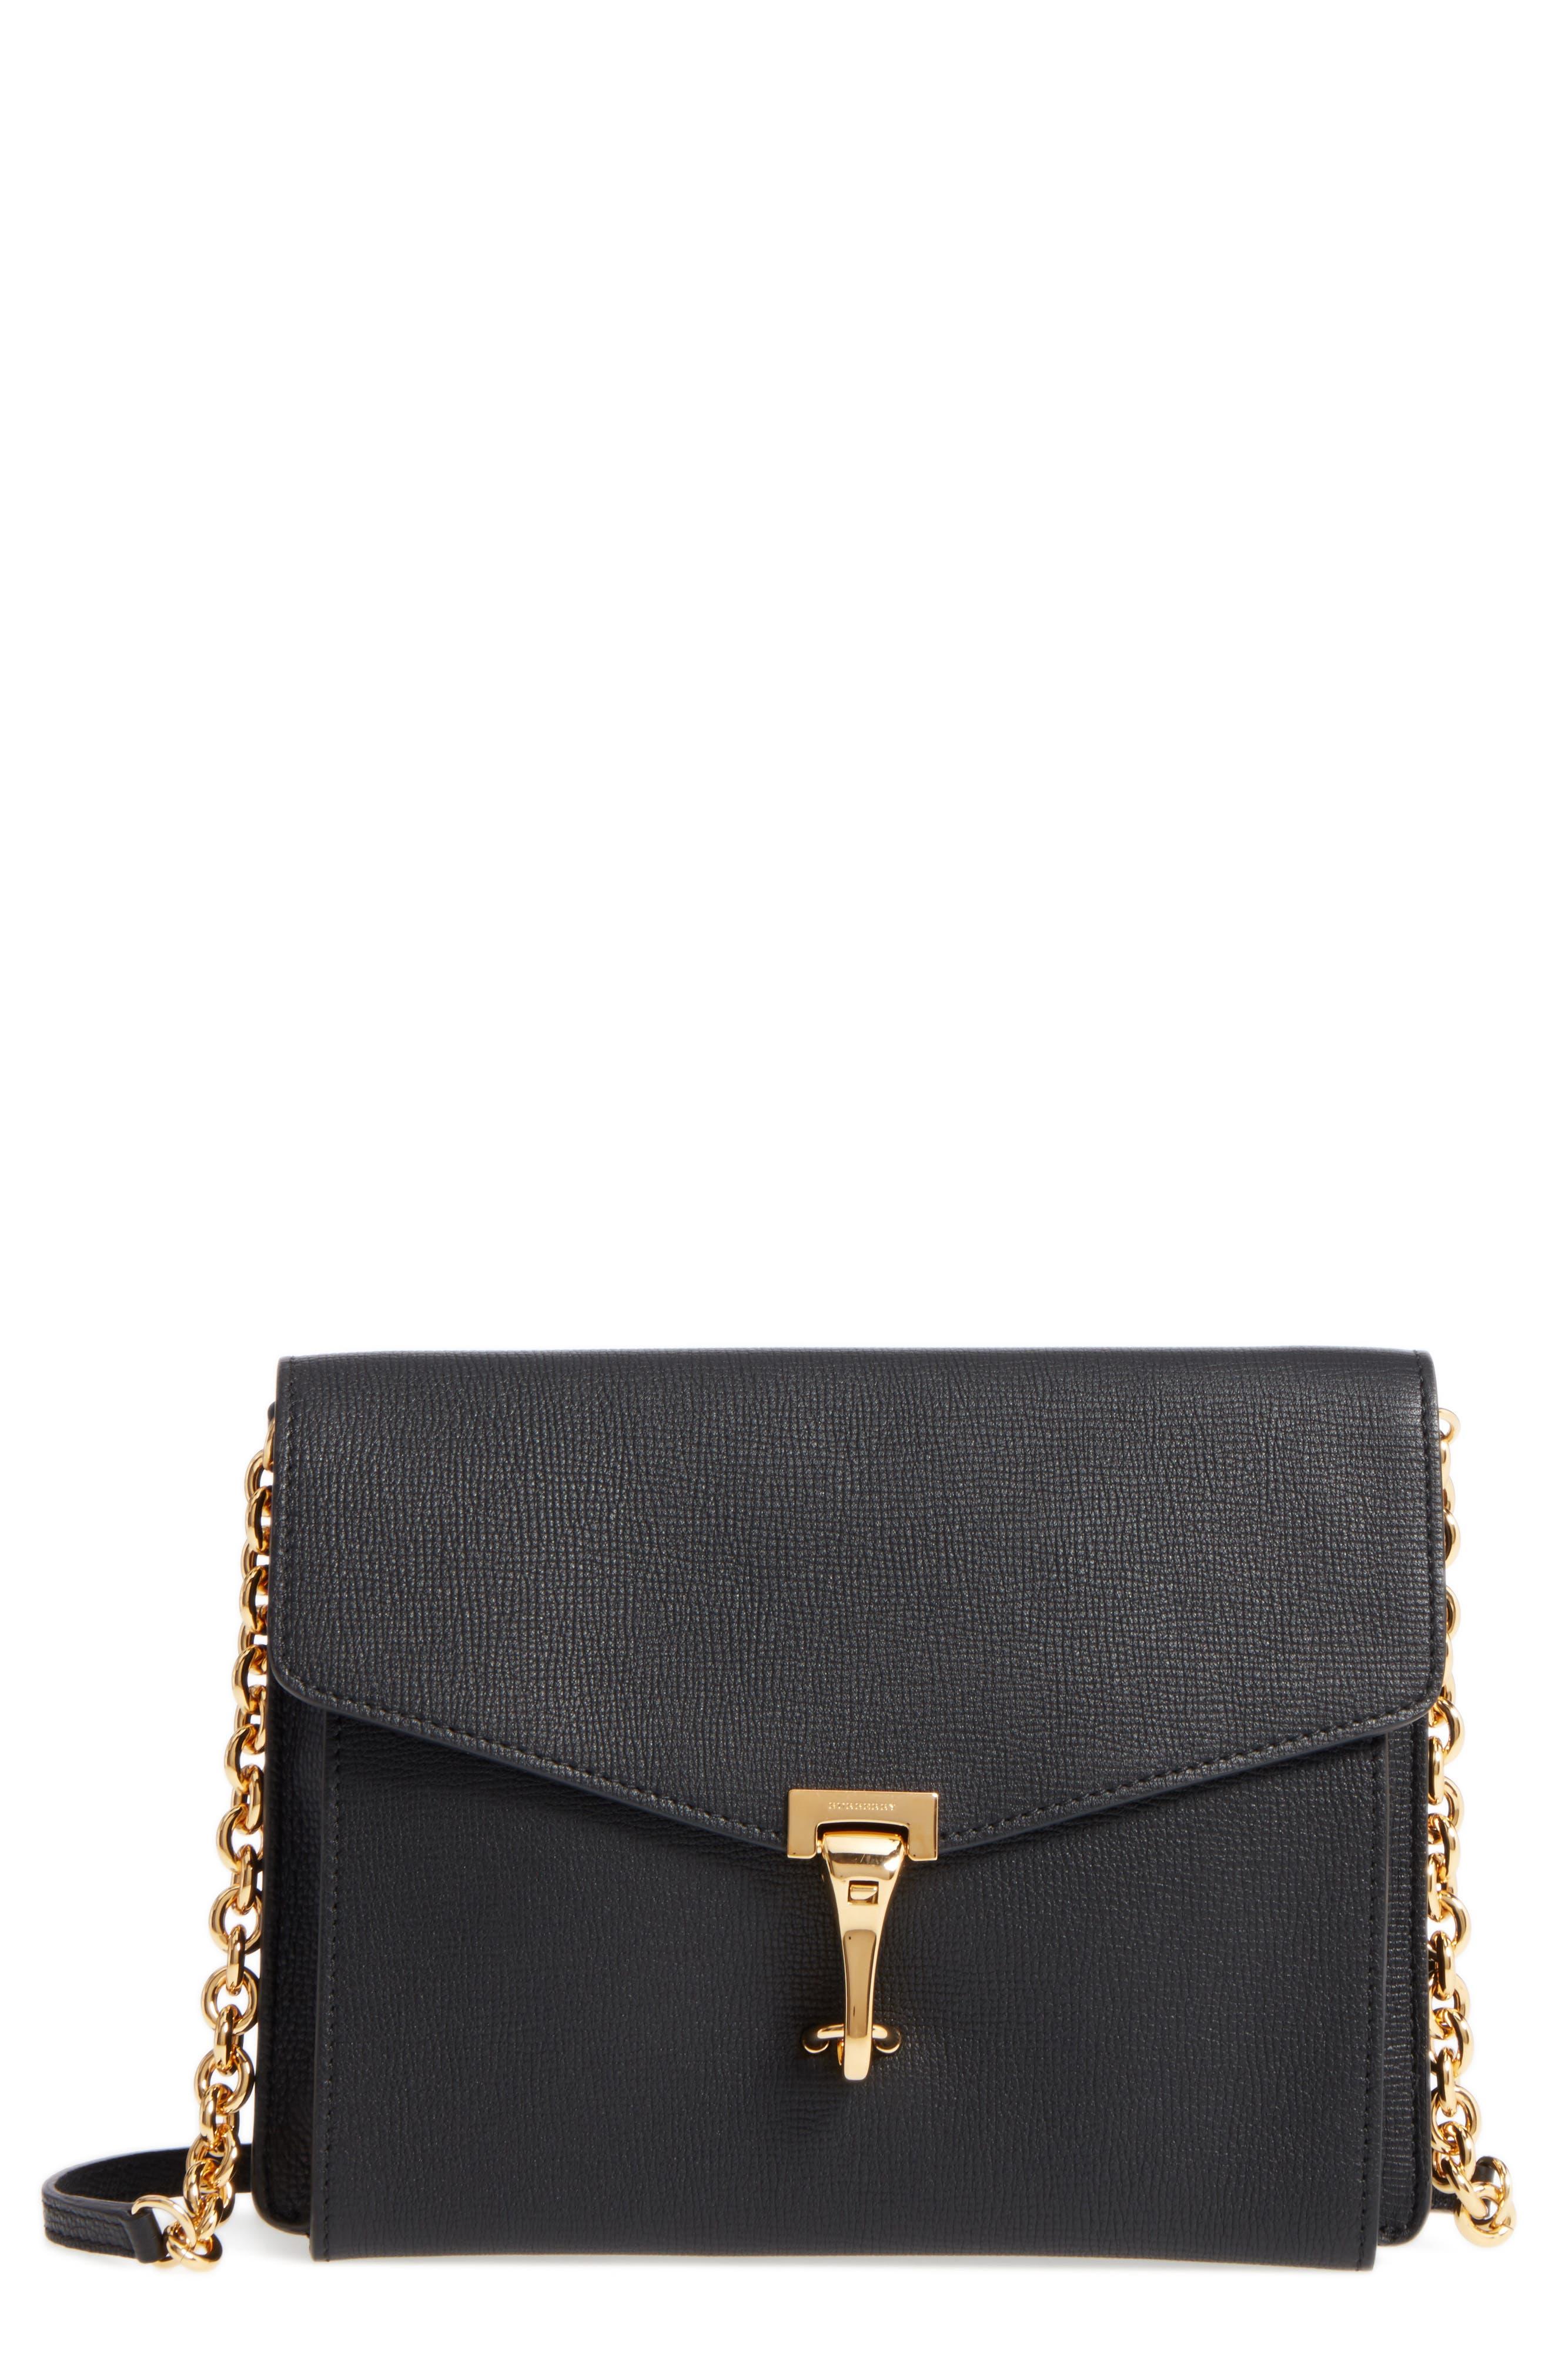 Burberry Macken Leather Crossbody Bag